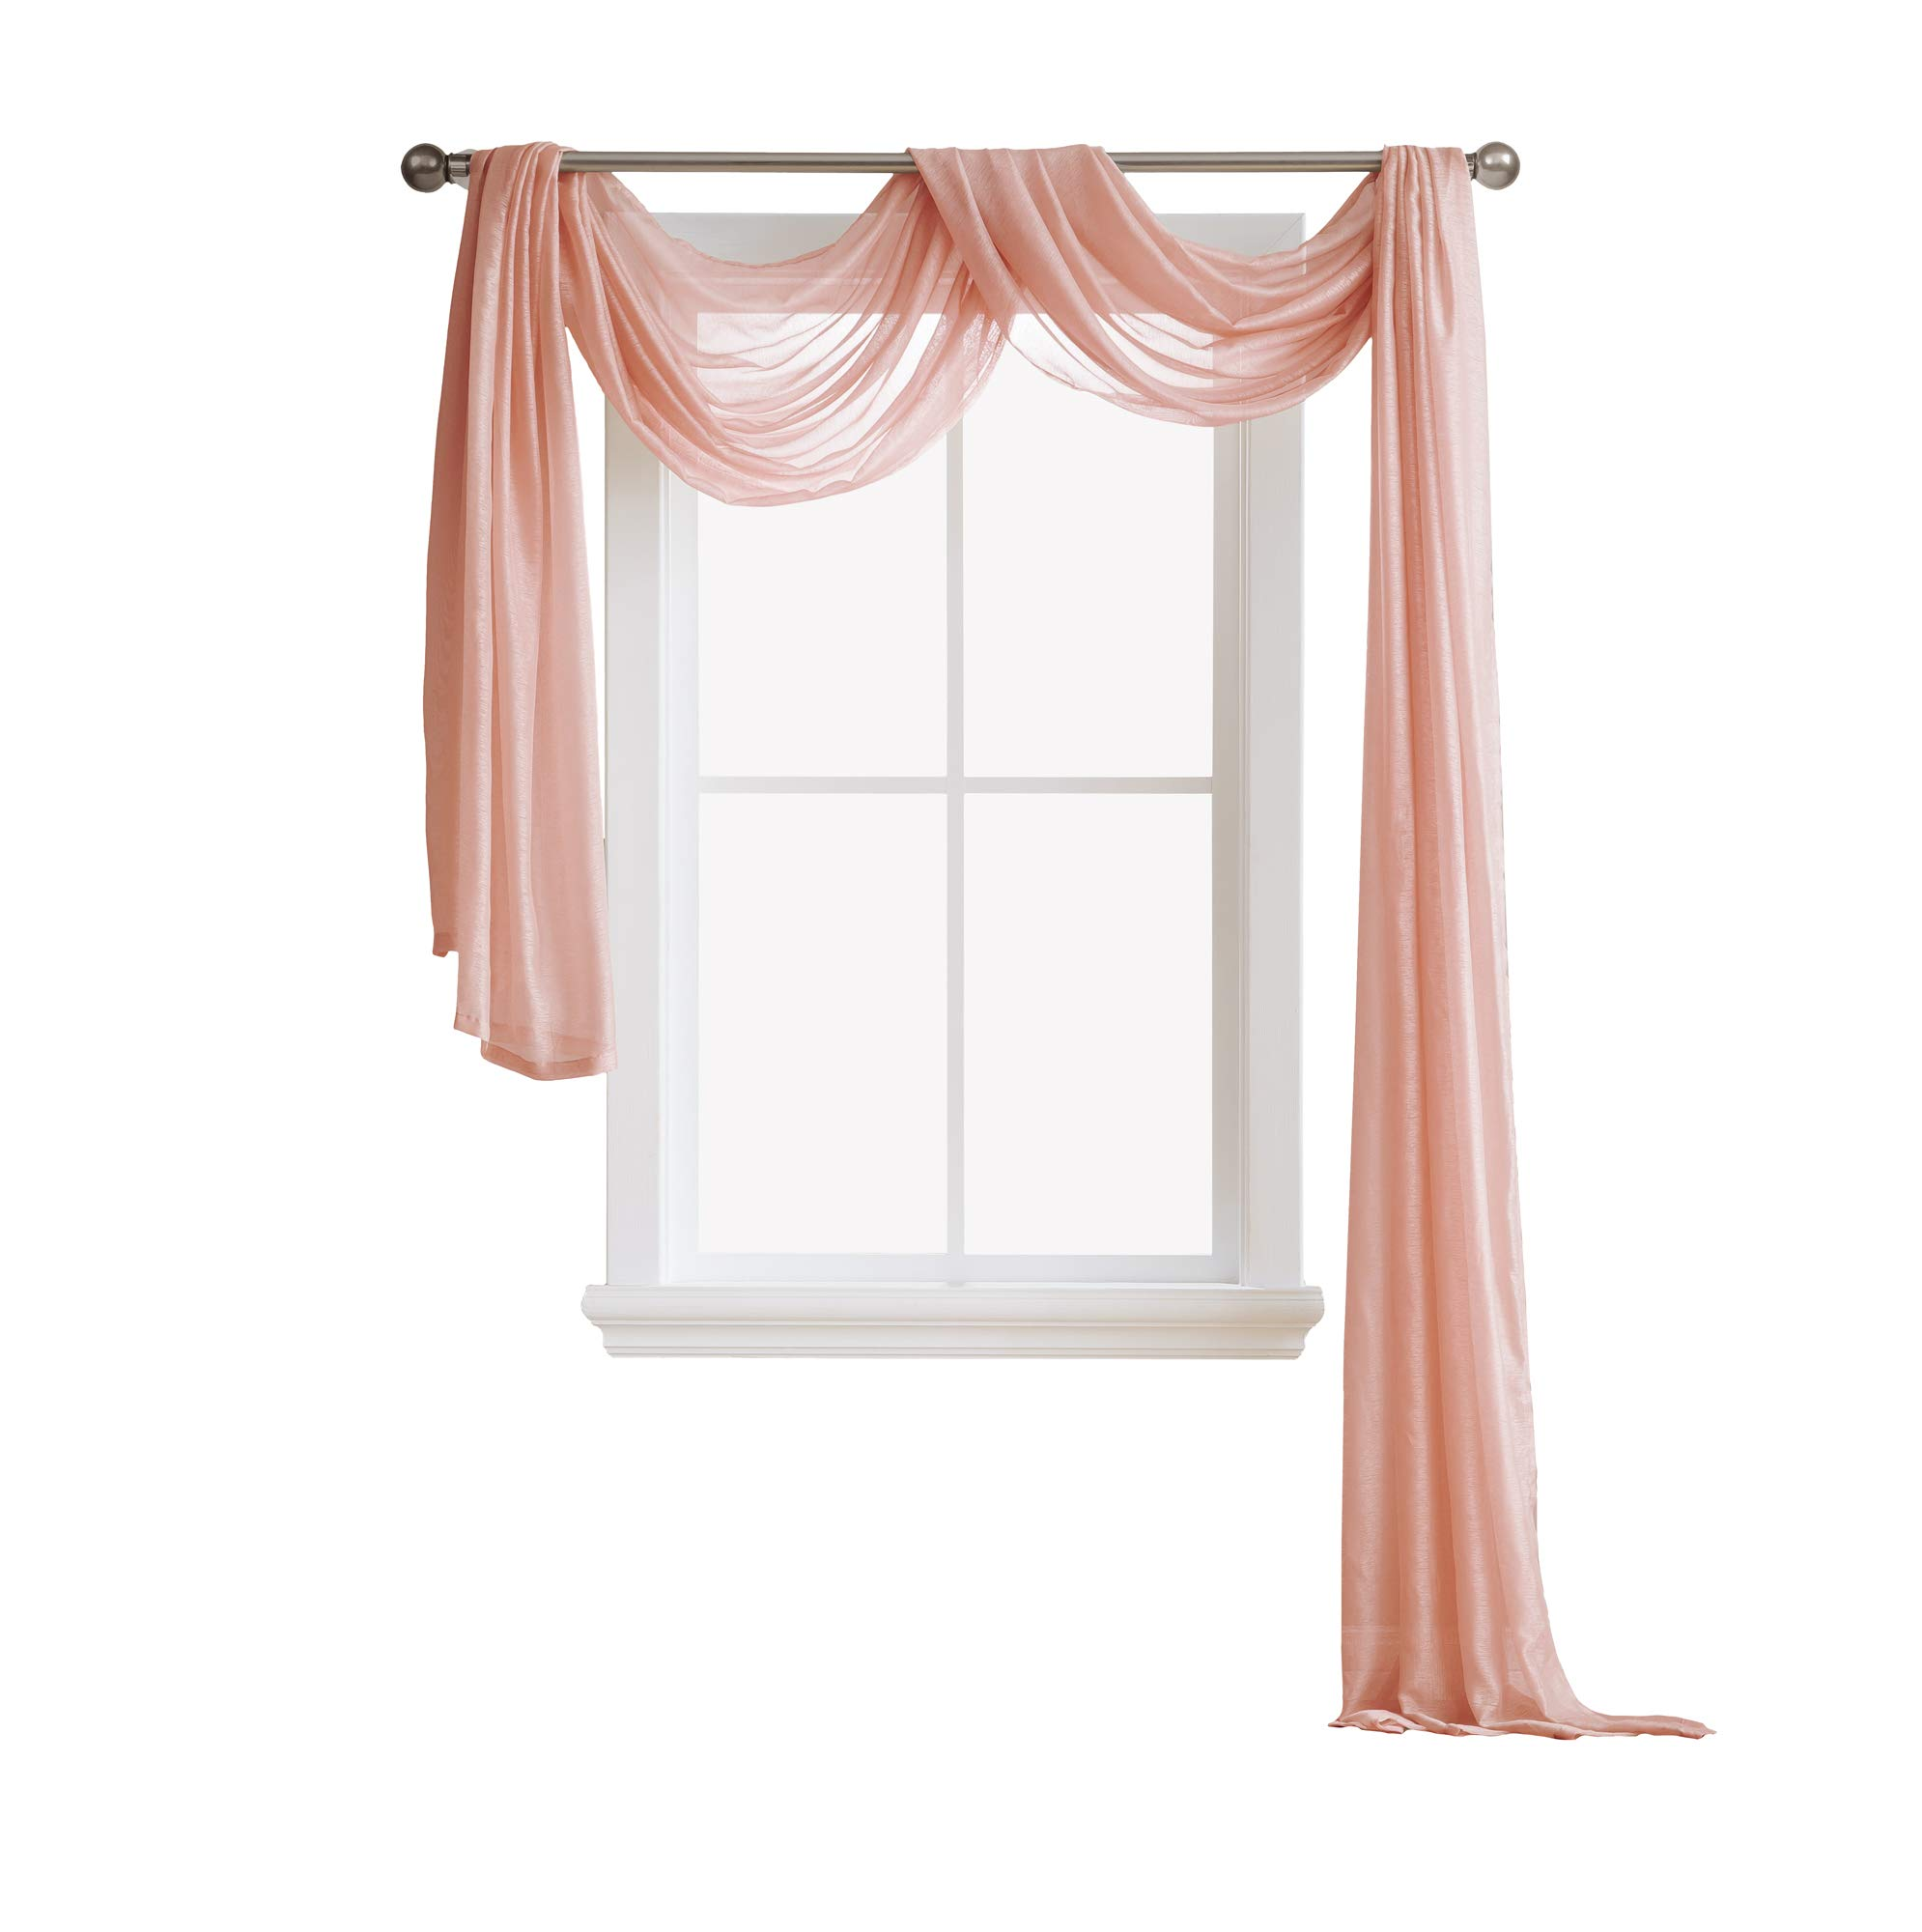 LinenZone Jane - Semi-Sheer Window Scarf (54 x 144) - Elegant Home Decor Window Treatments - Add to Window Curtains Enhanced Effect (1 Scarf 54'' x 144'', Coral)